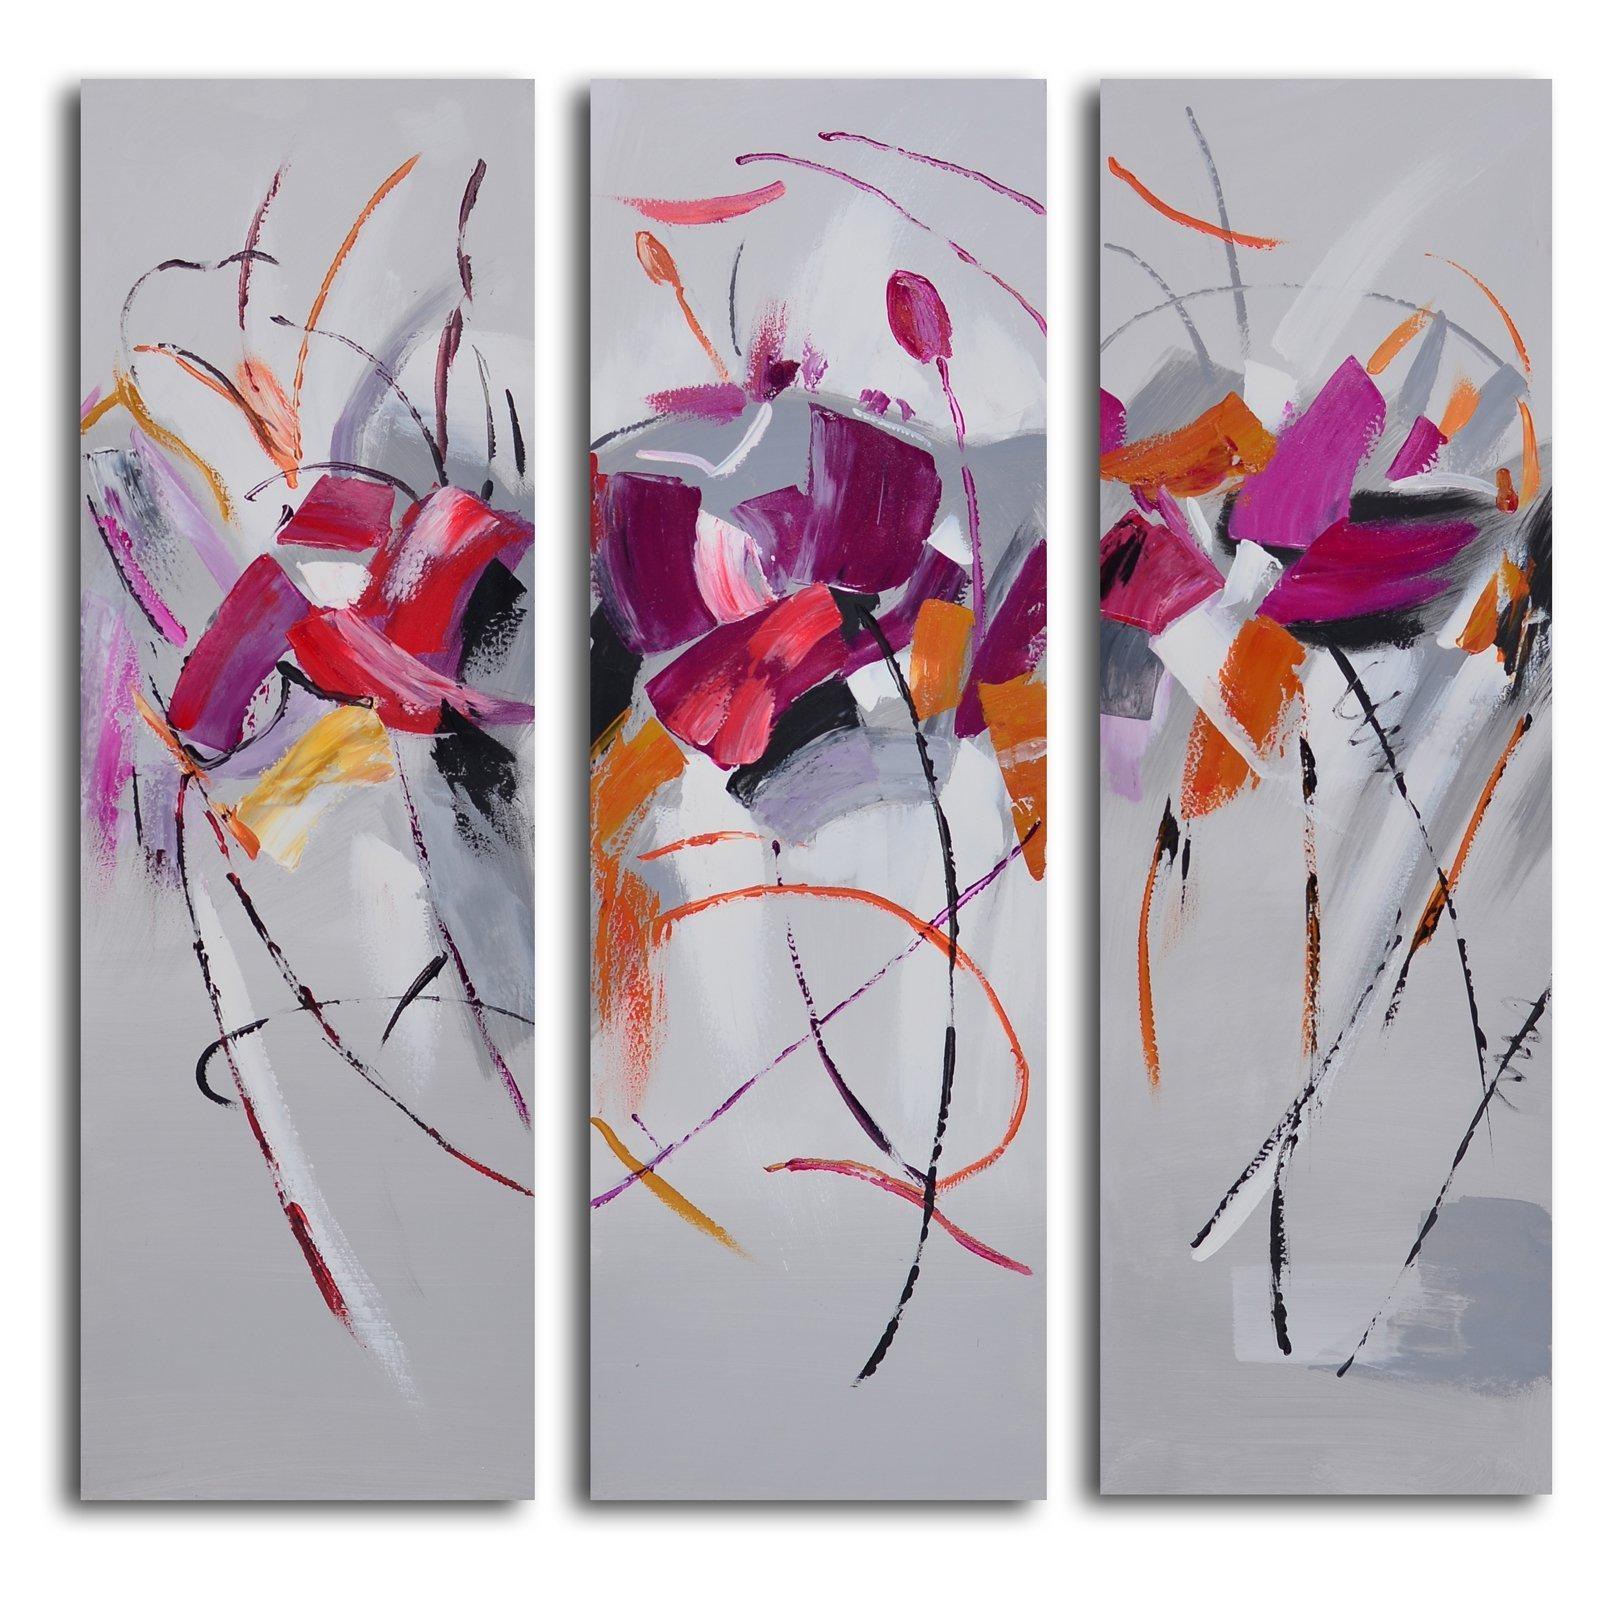 Muddied Floral March 3 Piece Canvas Wall Art Set | Hayneedle Regarding 3 Piece Wall Art (Image 14 of 20)